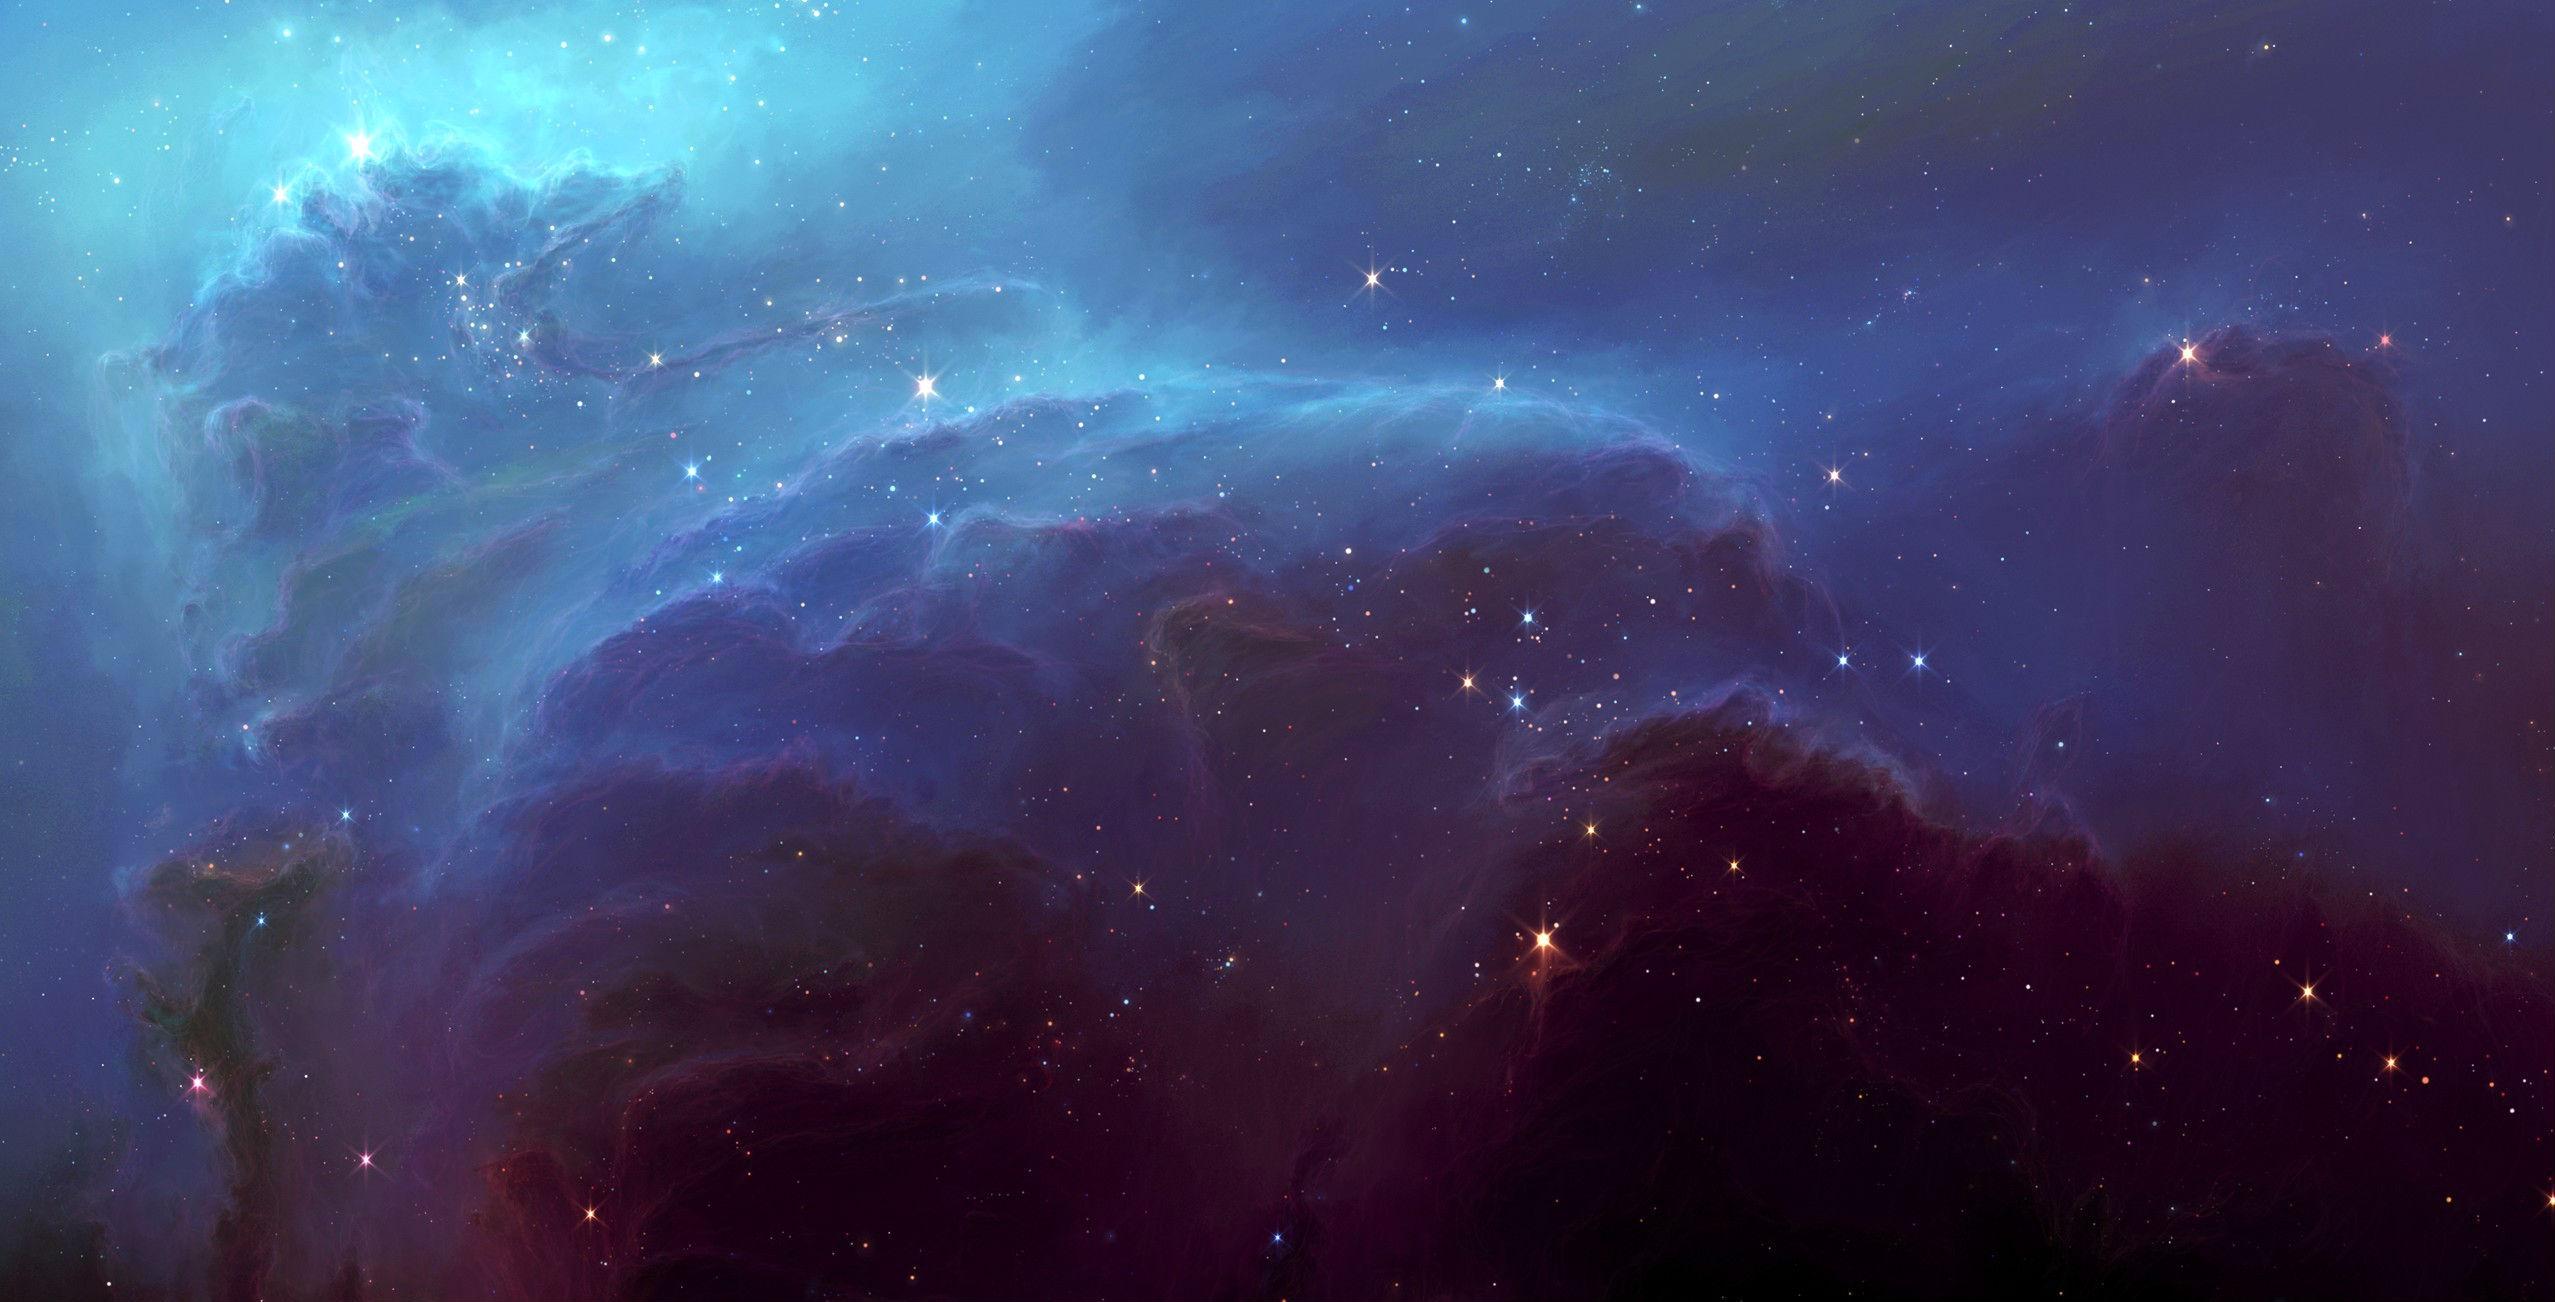 Nebula Computer Wallpapers Desktop Backgrounds 2555x1302